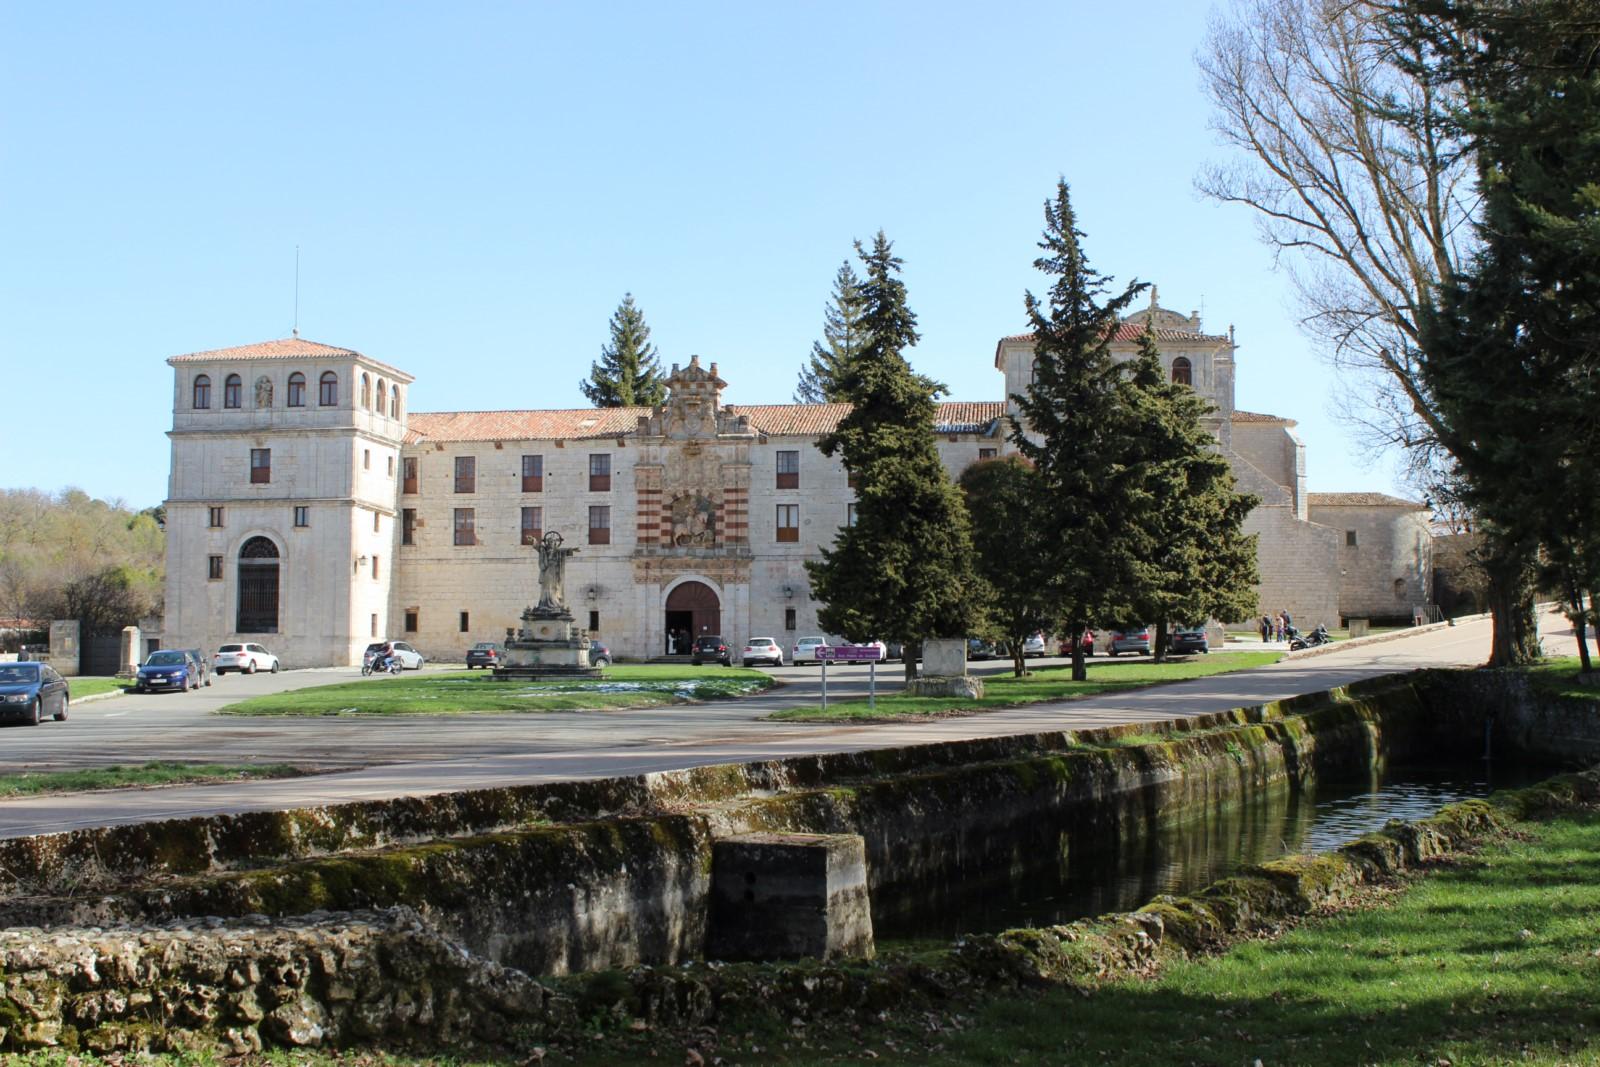 Monasterio de San Pedro de Cardeña Burgos